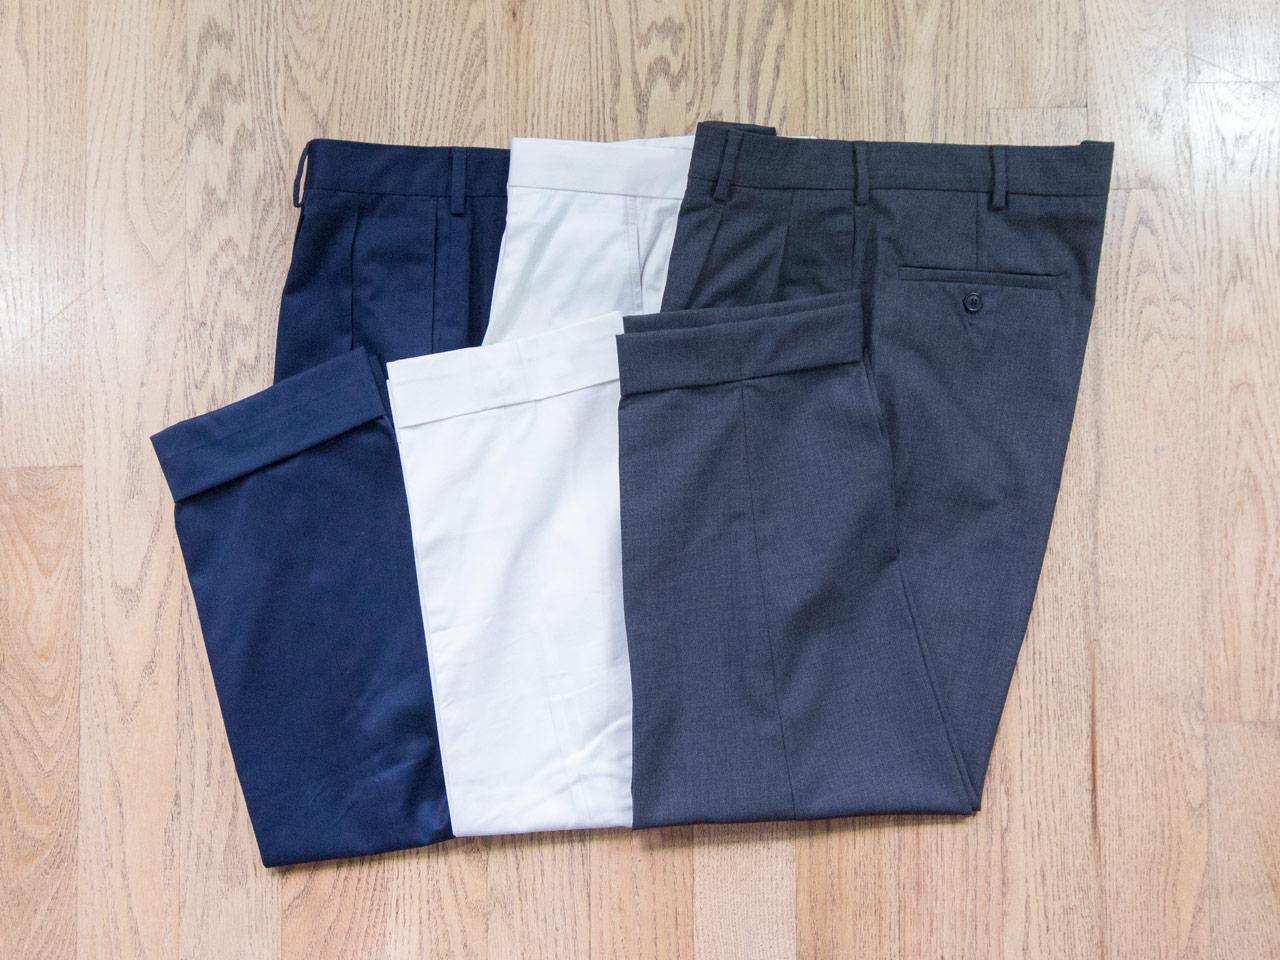 effortless essentials minimalist wardrobe - trousers dress chinos